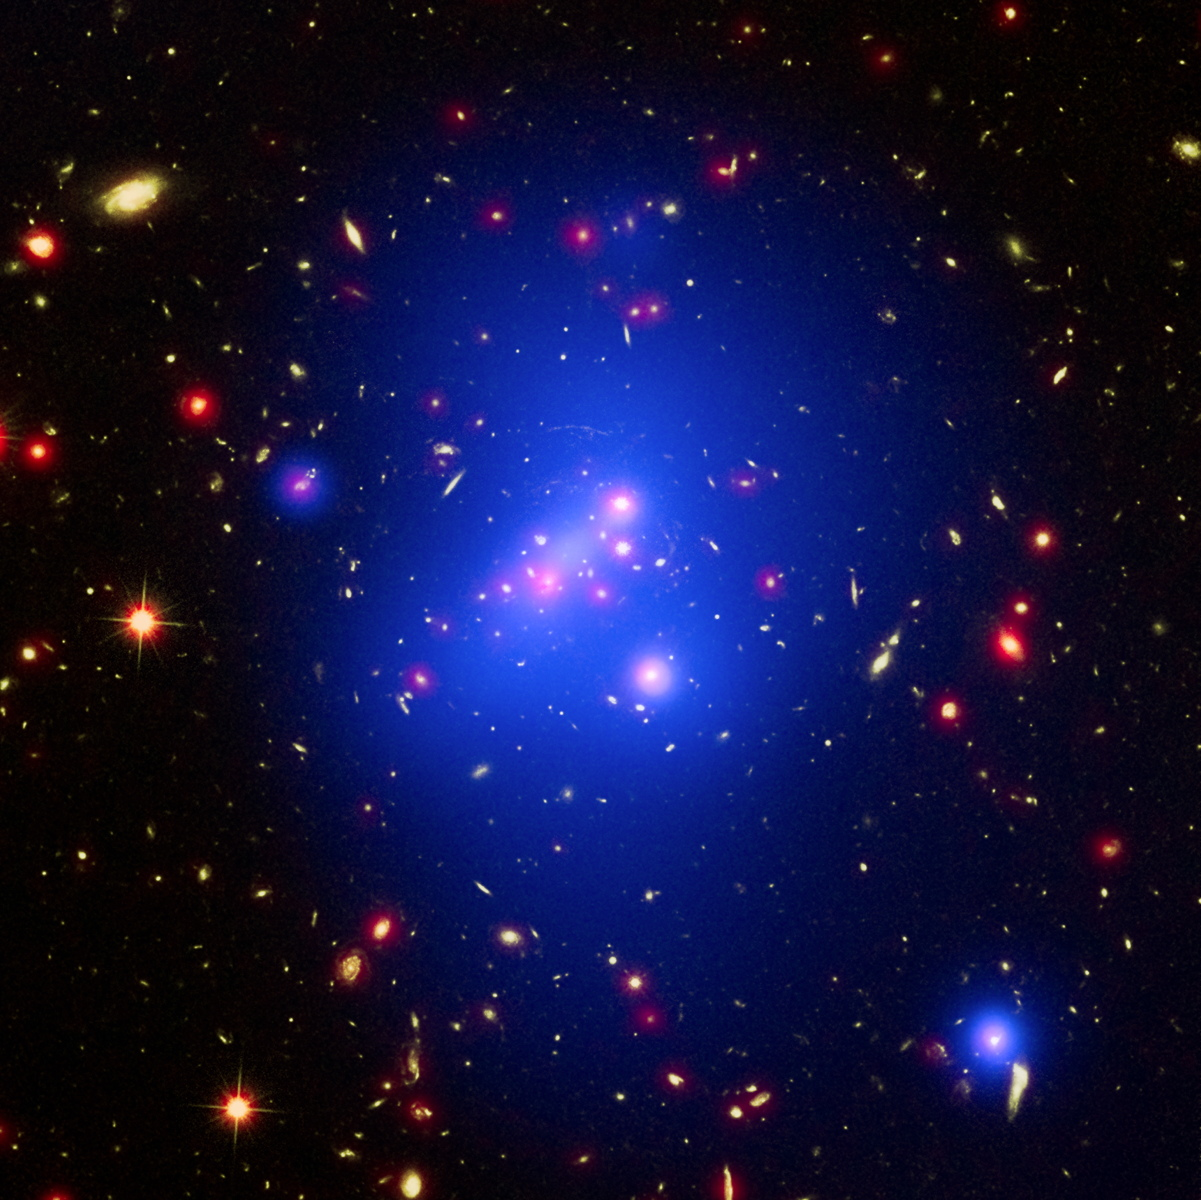 Galactic Cluster IDCS 1426